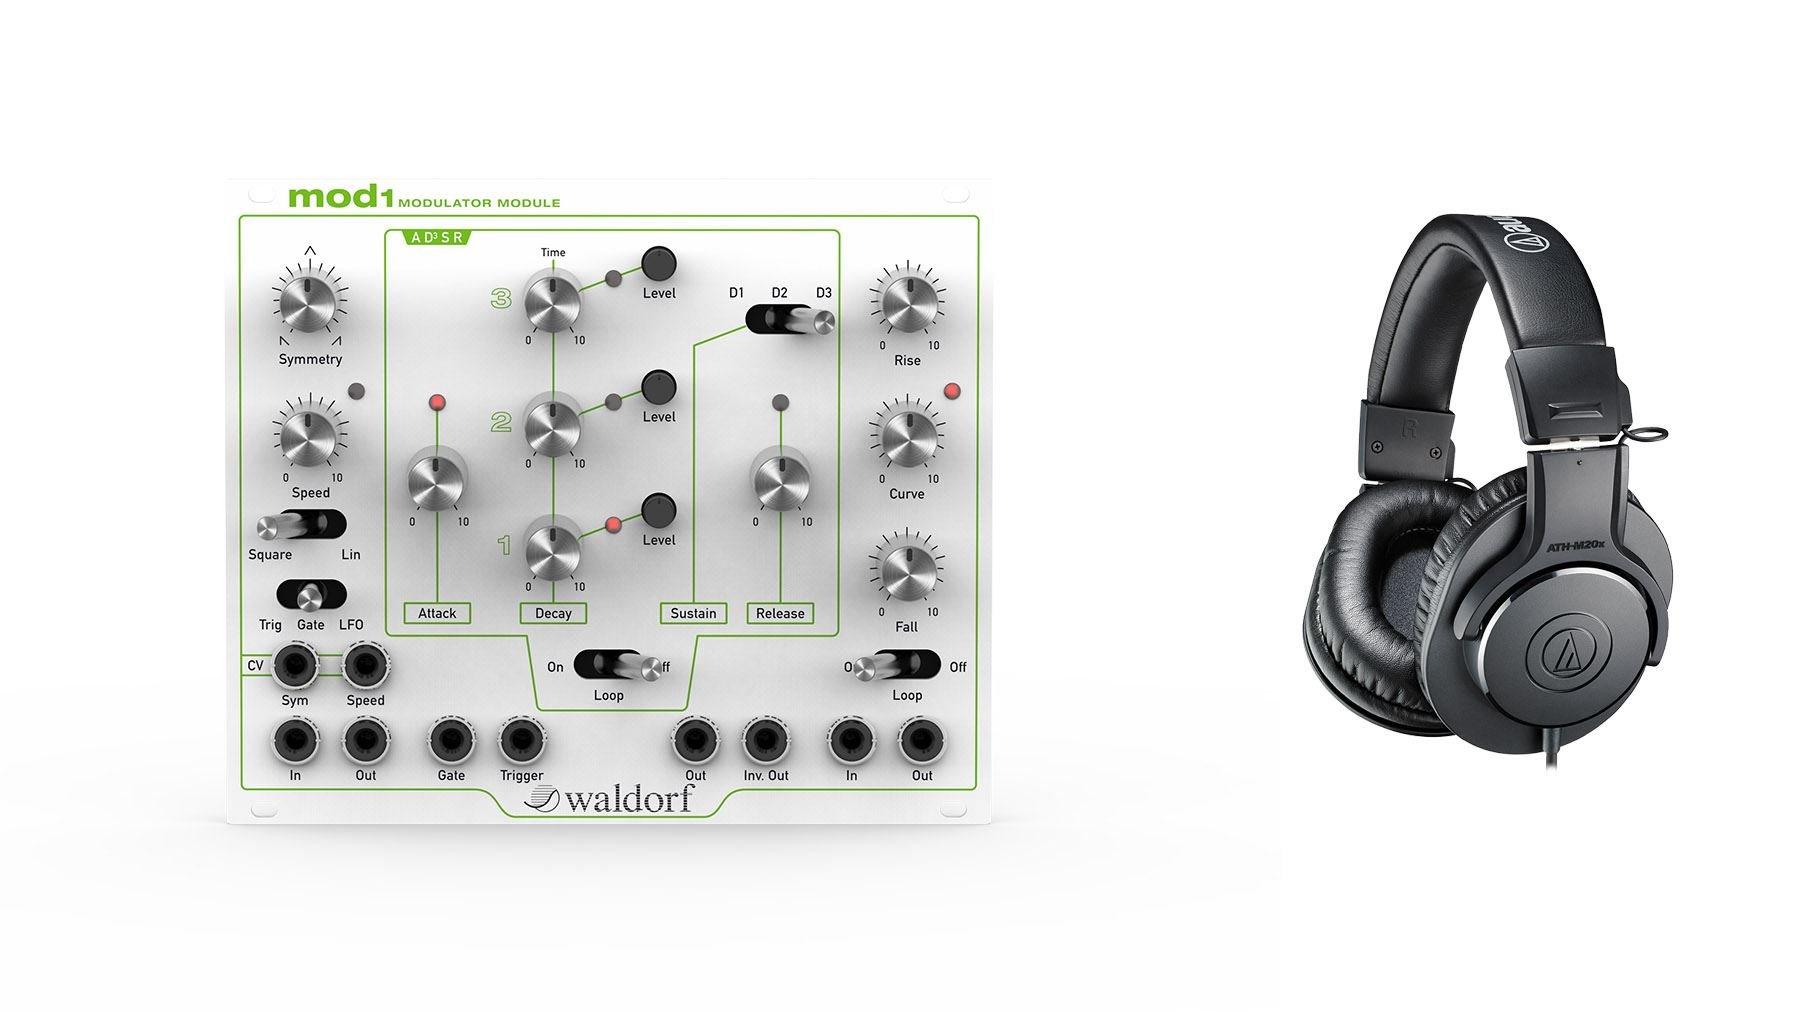 Waldorf MOD1 Eurorack Modulator Bundle with Audio-Technica ATH-M20x Headphones (2 Items) by Waldorf (Image #1)